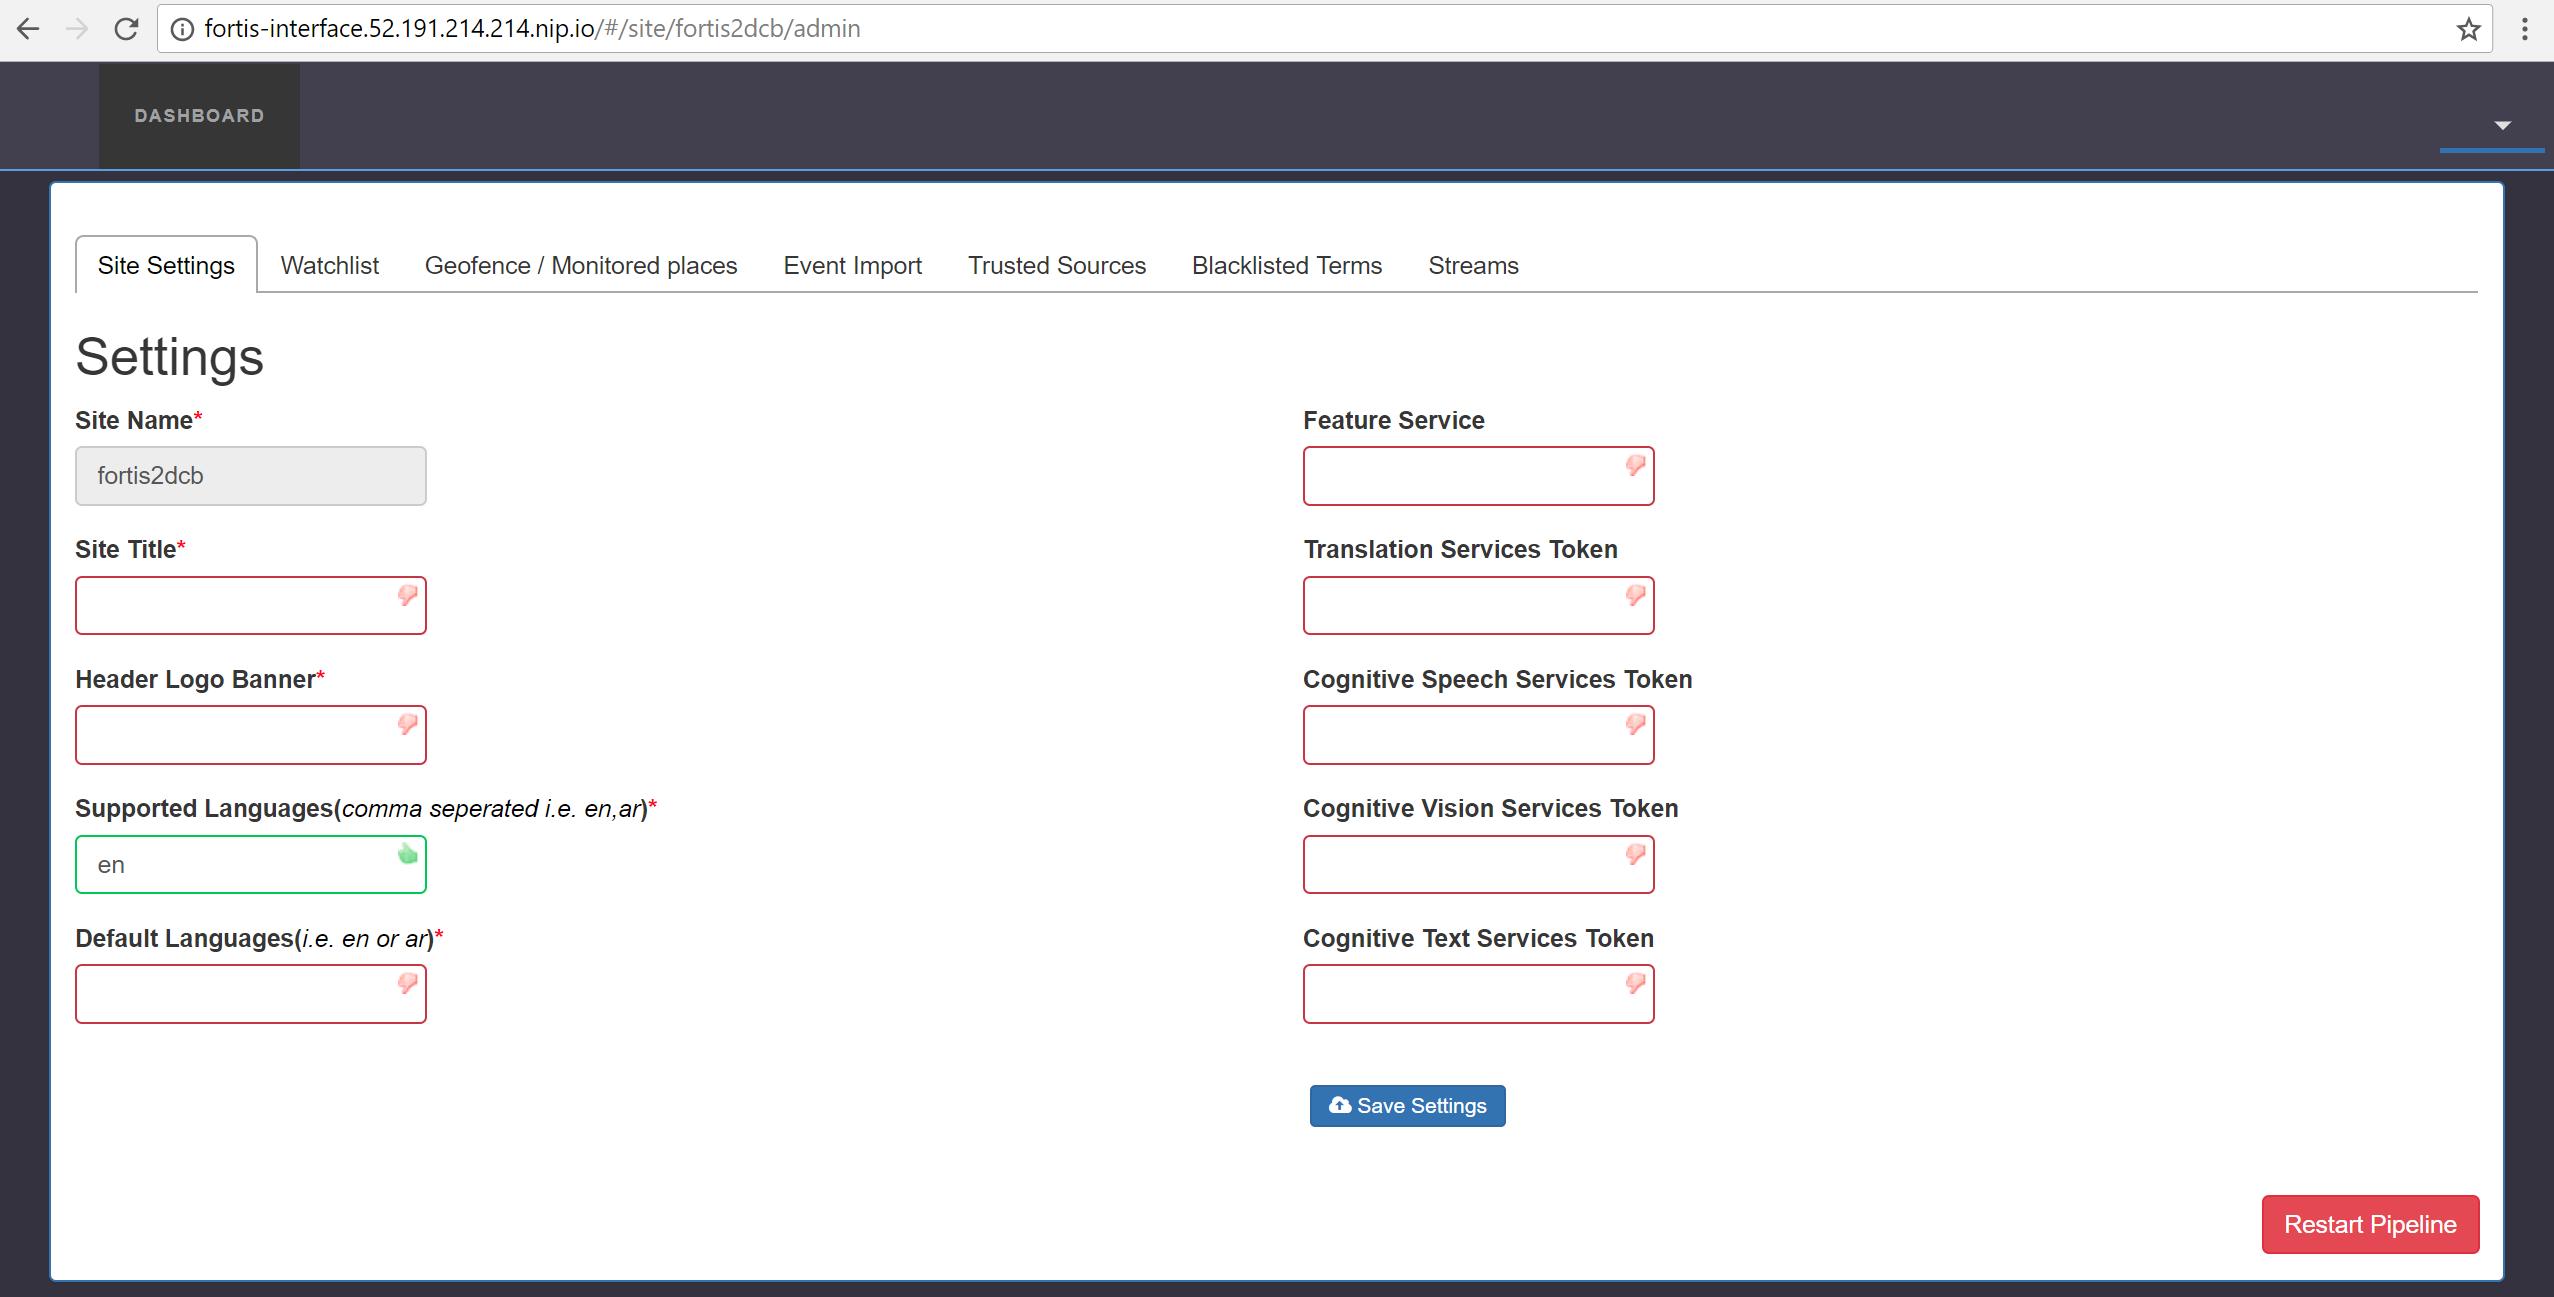 Screenshot showing the Fortis admin interface